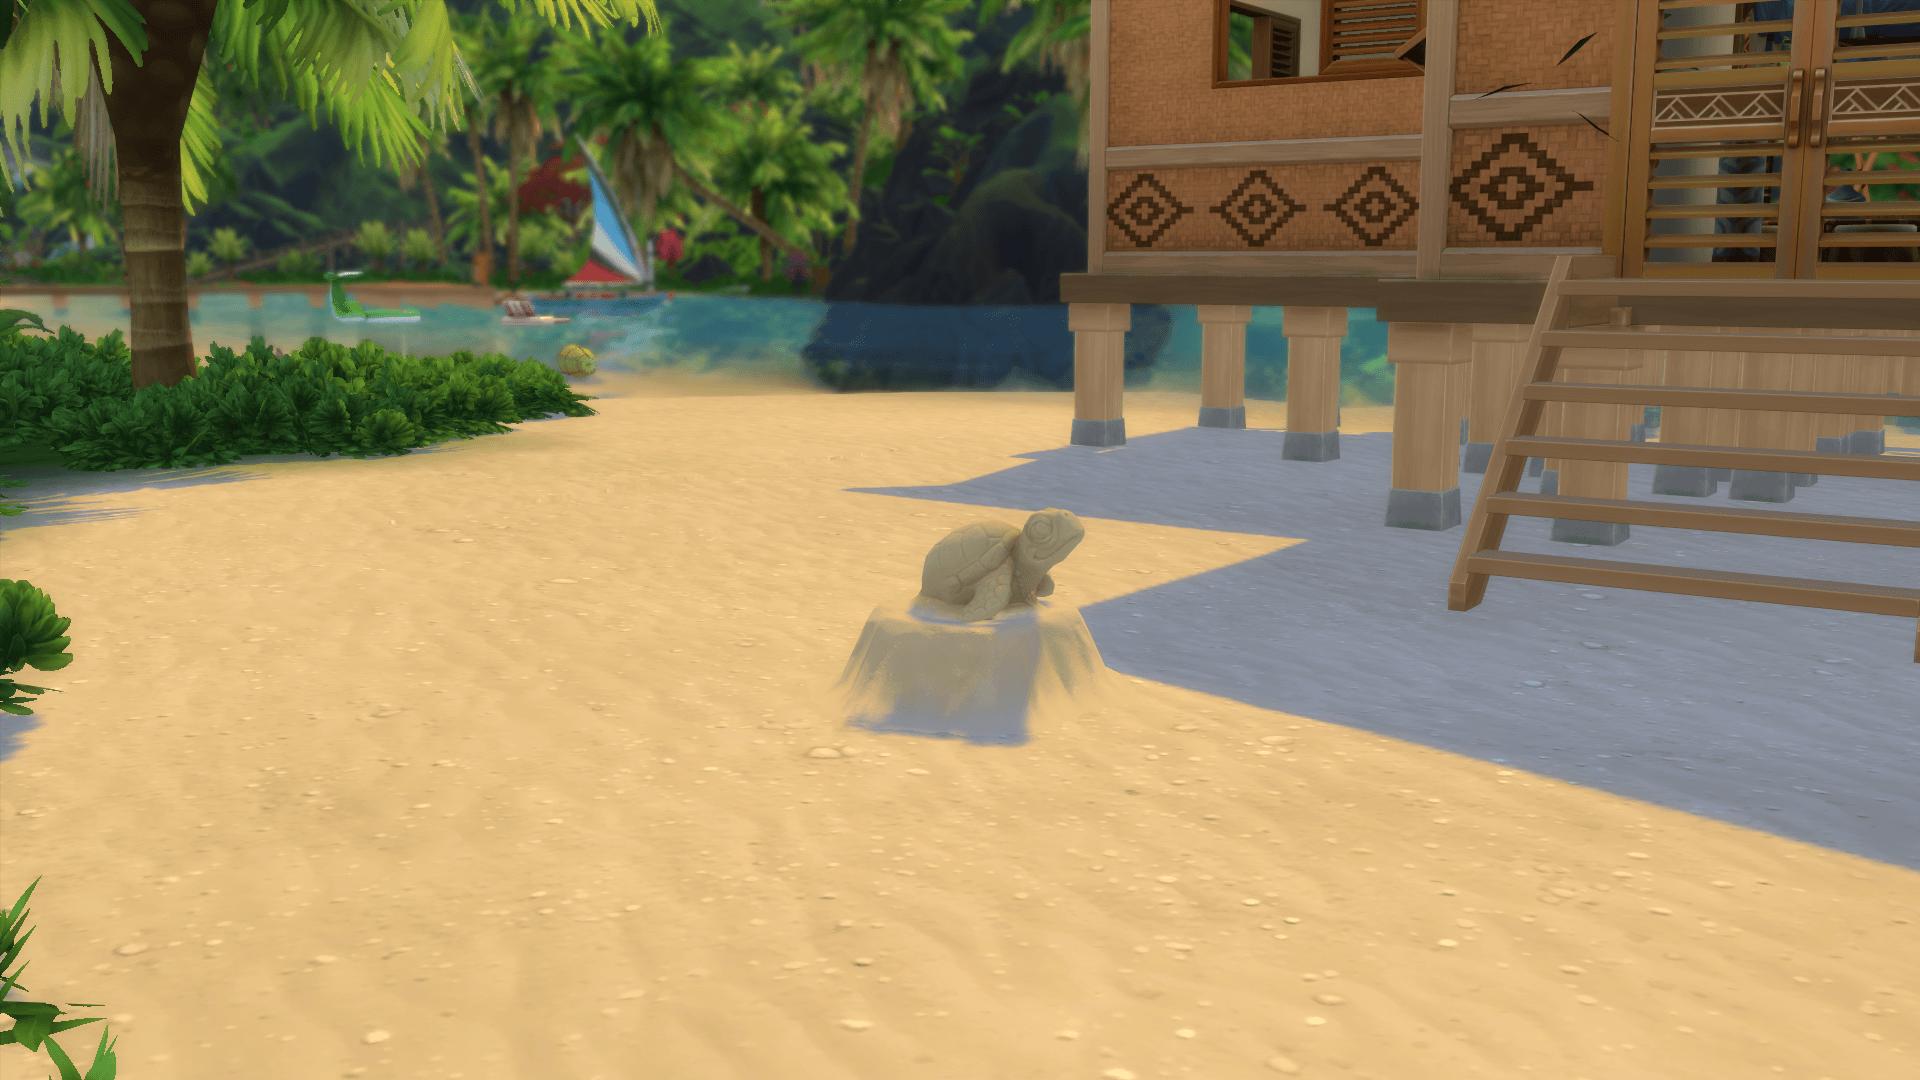 Sculpture sable sims 4 iles paradisiaques